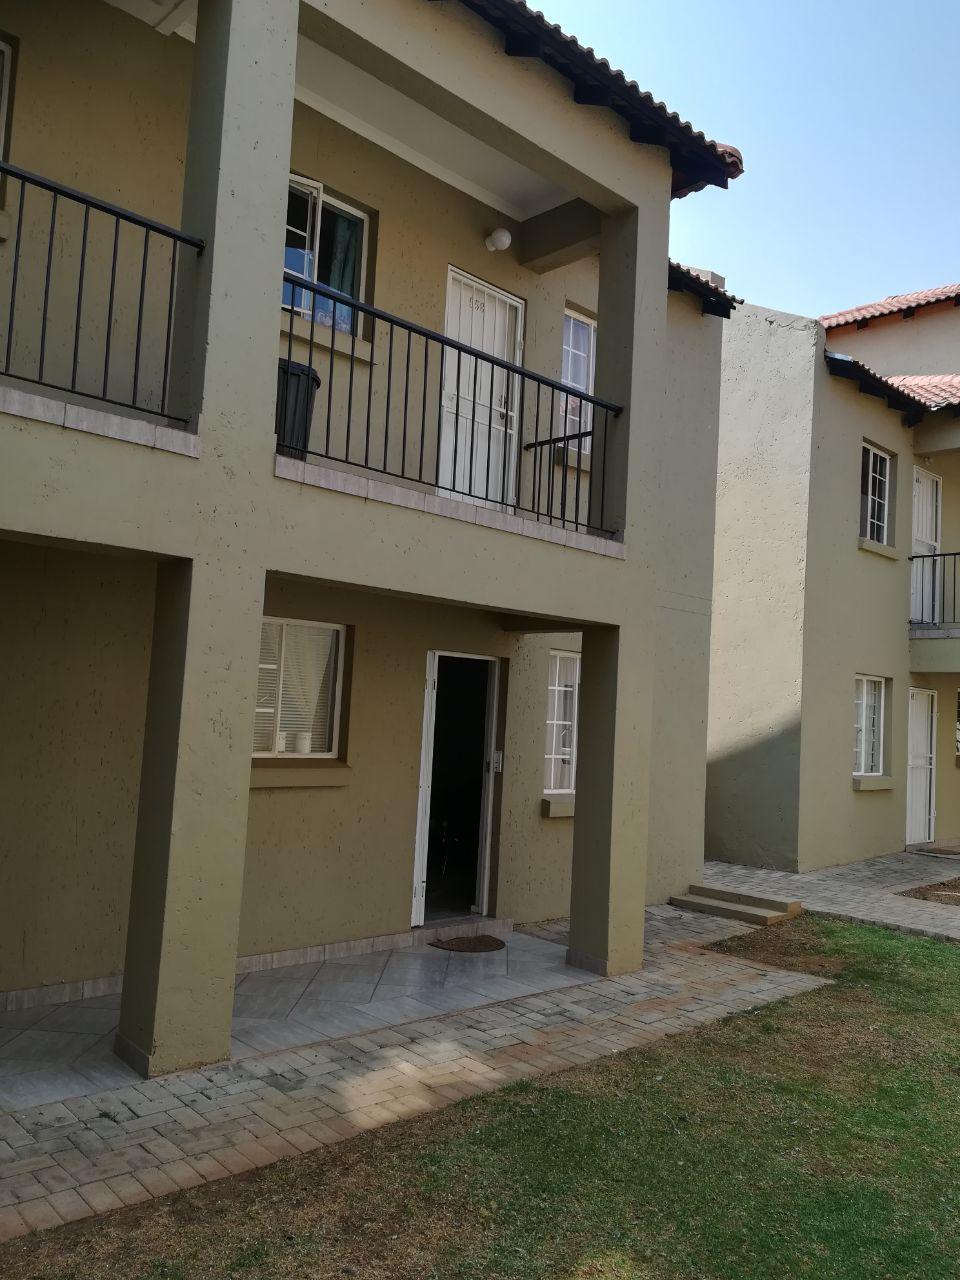 2 Bedroom Apartment for sale in Van Der Hoff Park ENT0066881 : photo#1